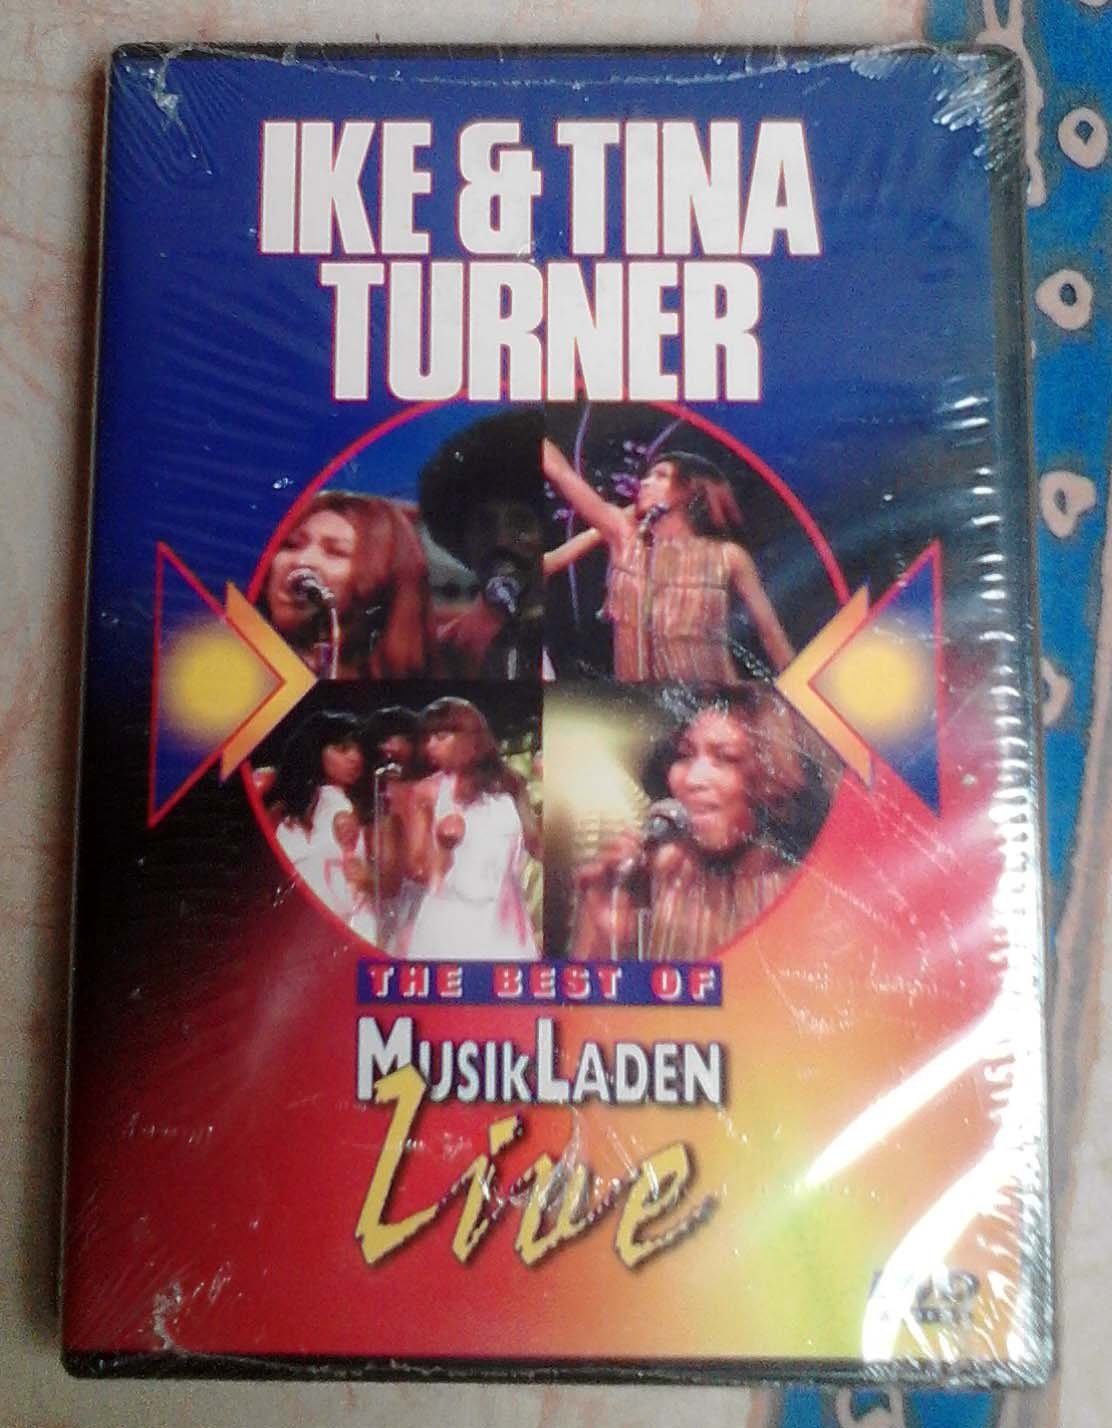 Ike & Tina Turner The Best Of MusikLaden Live DVD